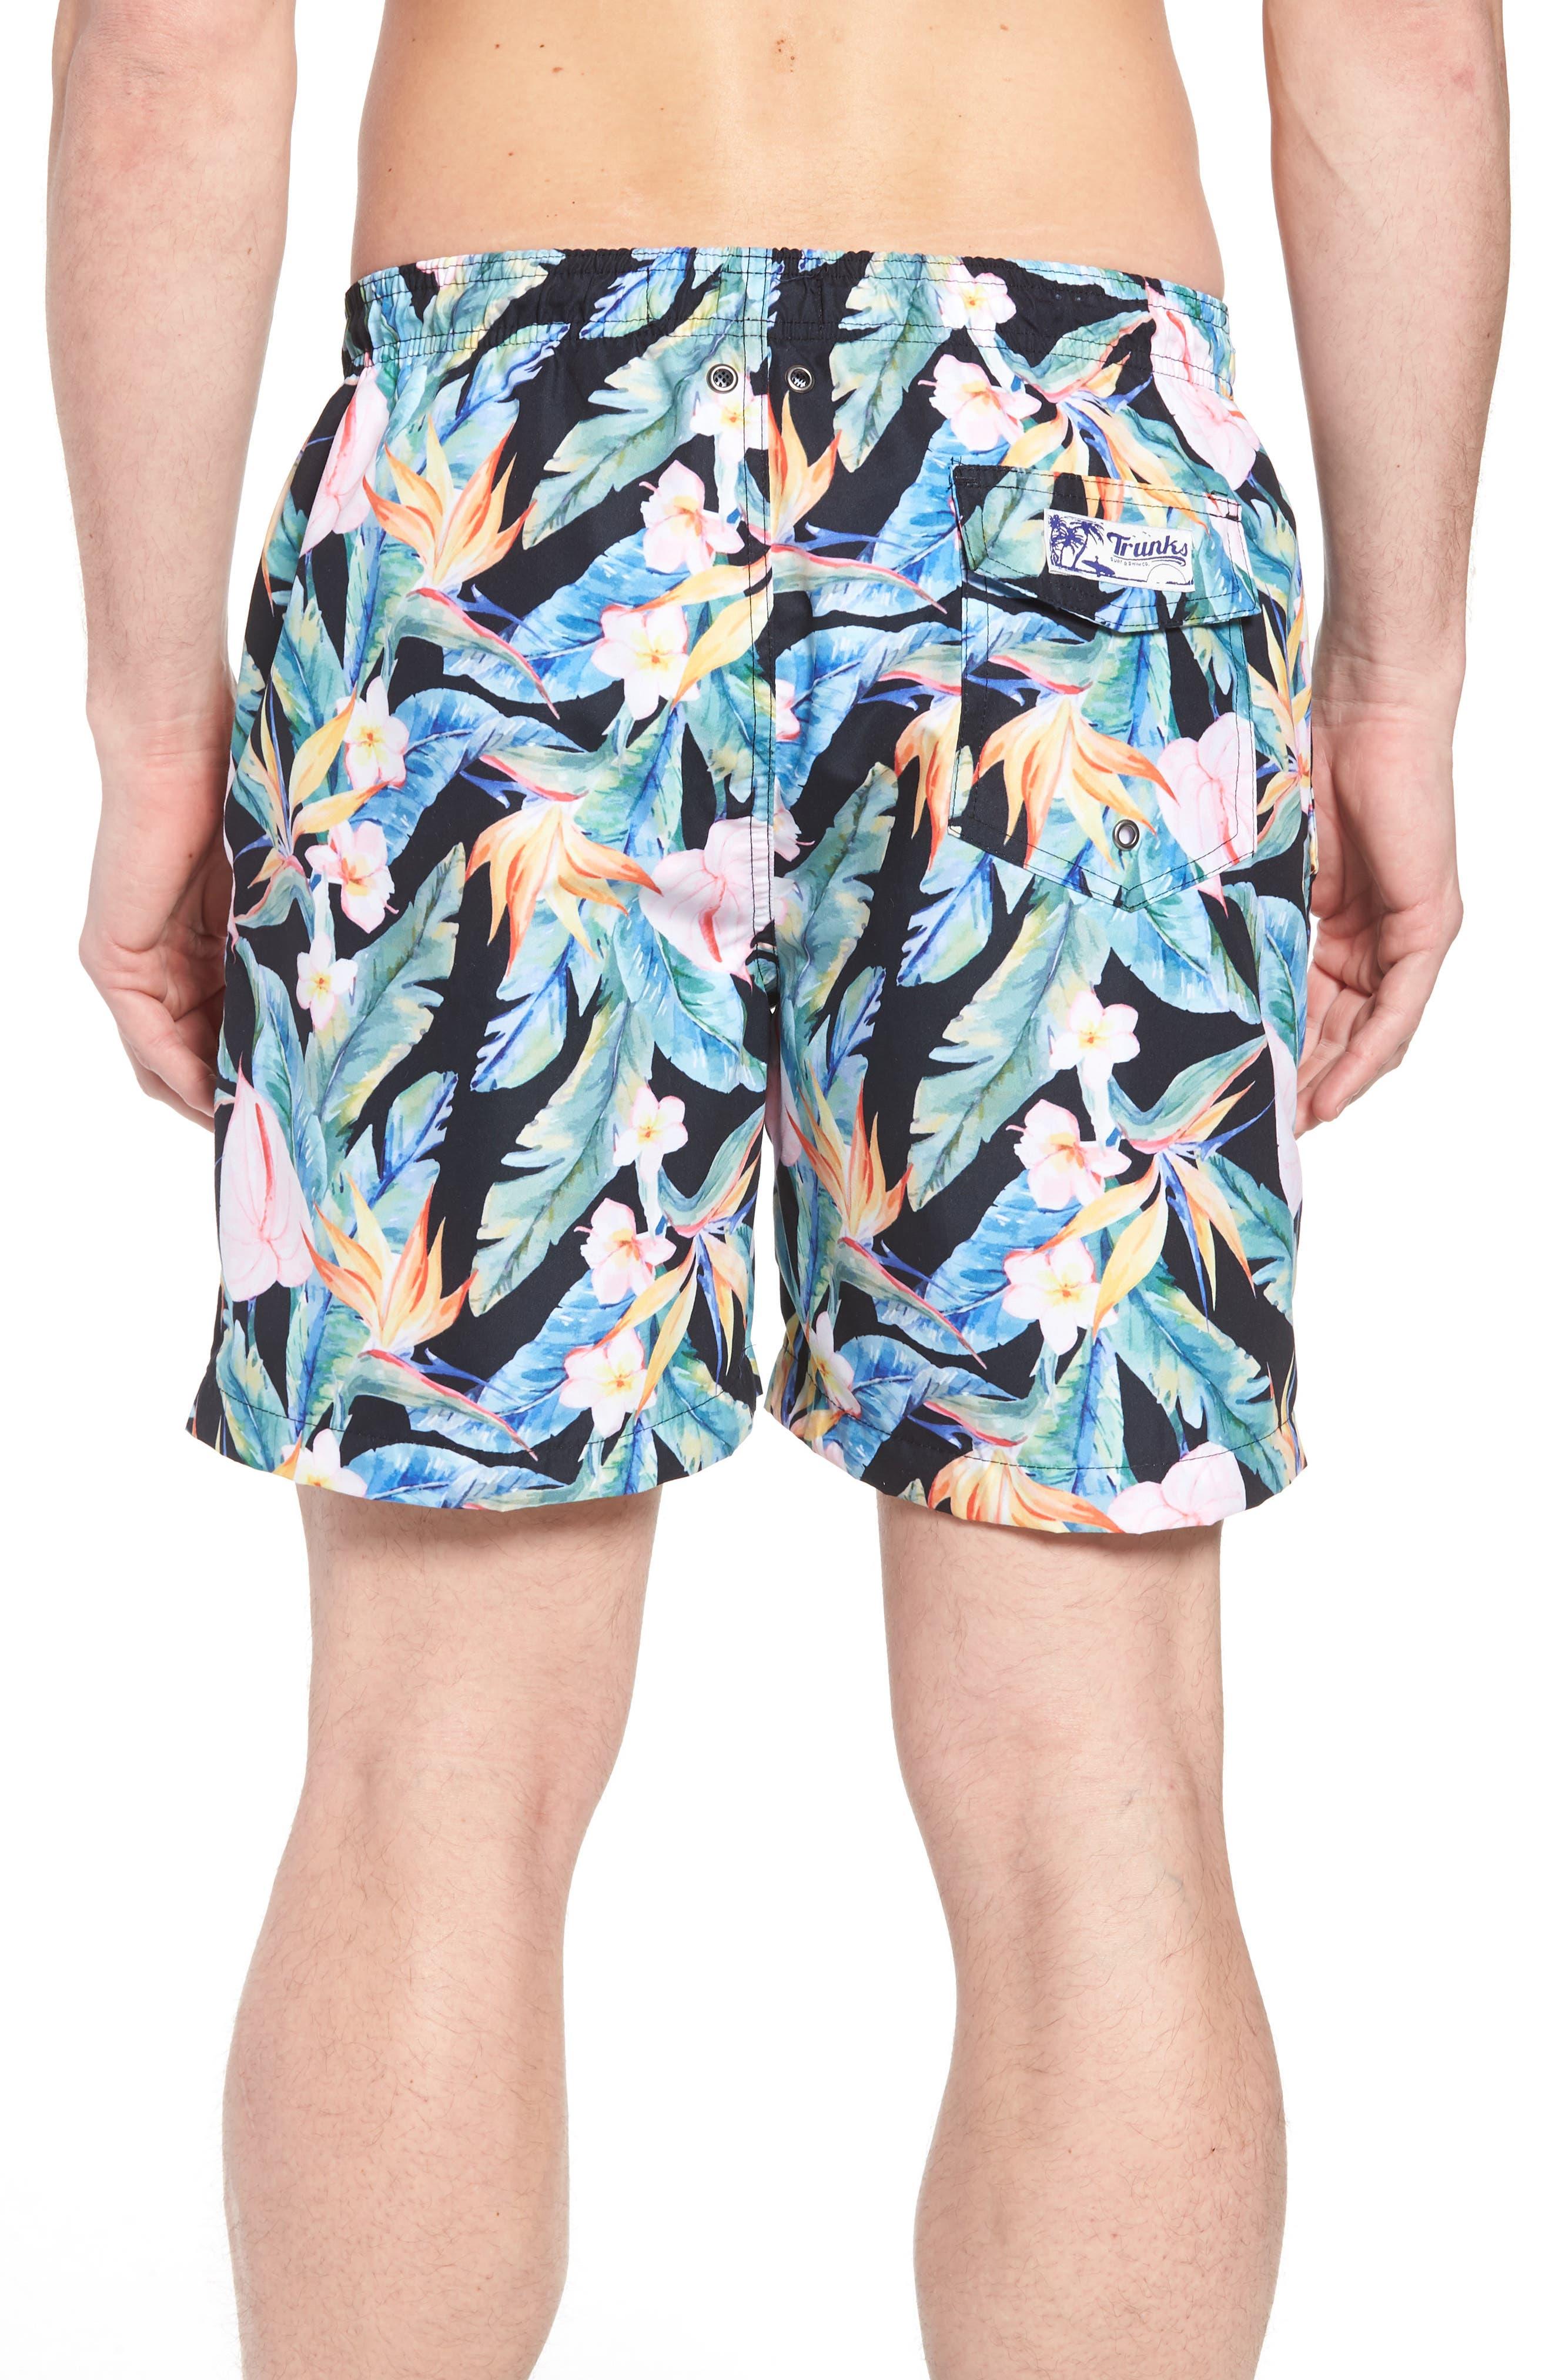 TRUNKS SURF & SWIM CO.,                             Floral Print Swim Trunks,                             Alternate thumbnail 2, color,                             400